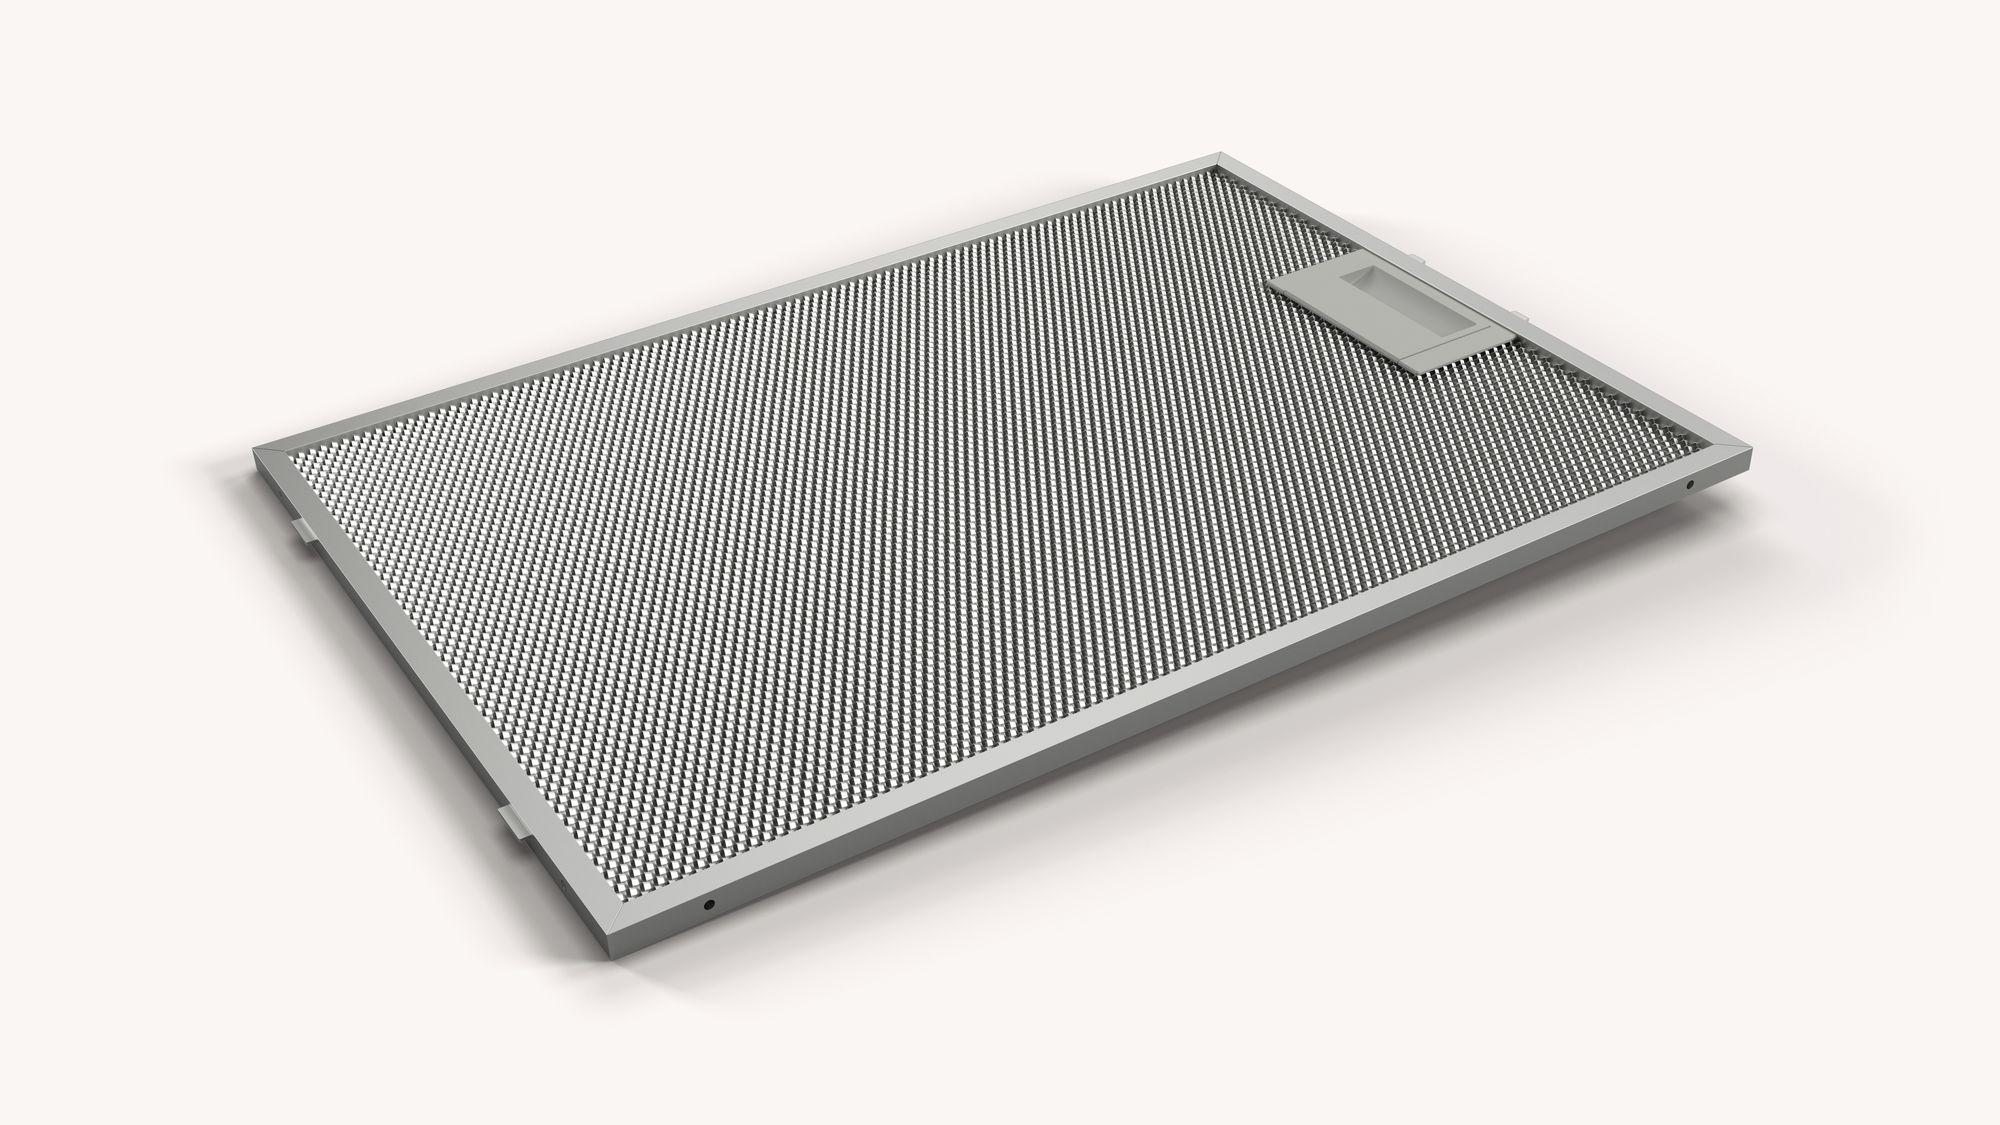 dunstabzugshaube constructa cd639650 edelstahl 60cm modulk chen bloc modulk che online kaufen. Black Bedroom Furniture Sets. Home Design Ideas